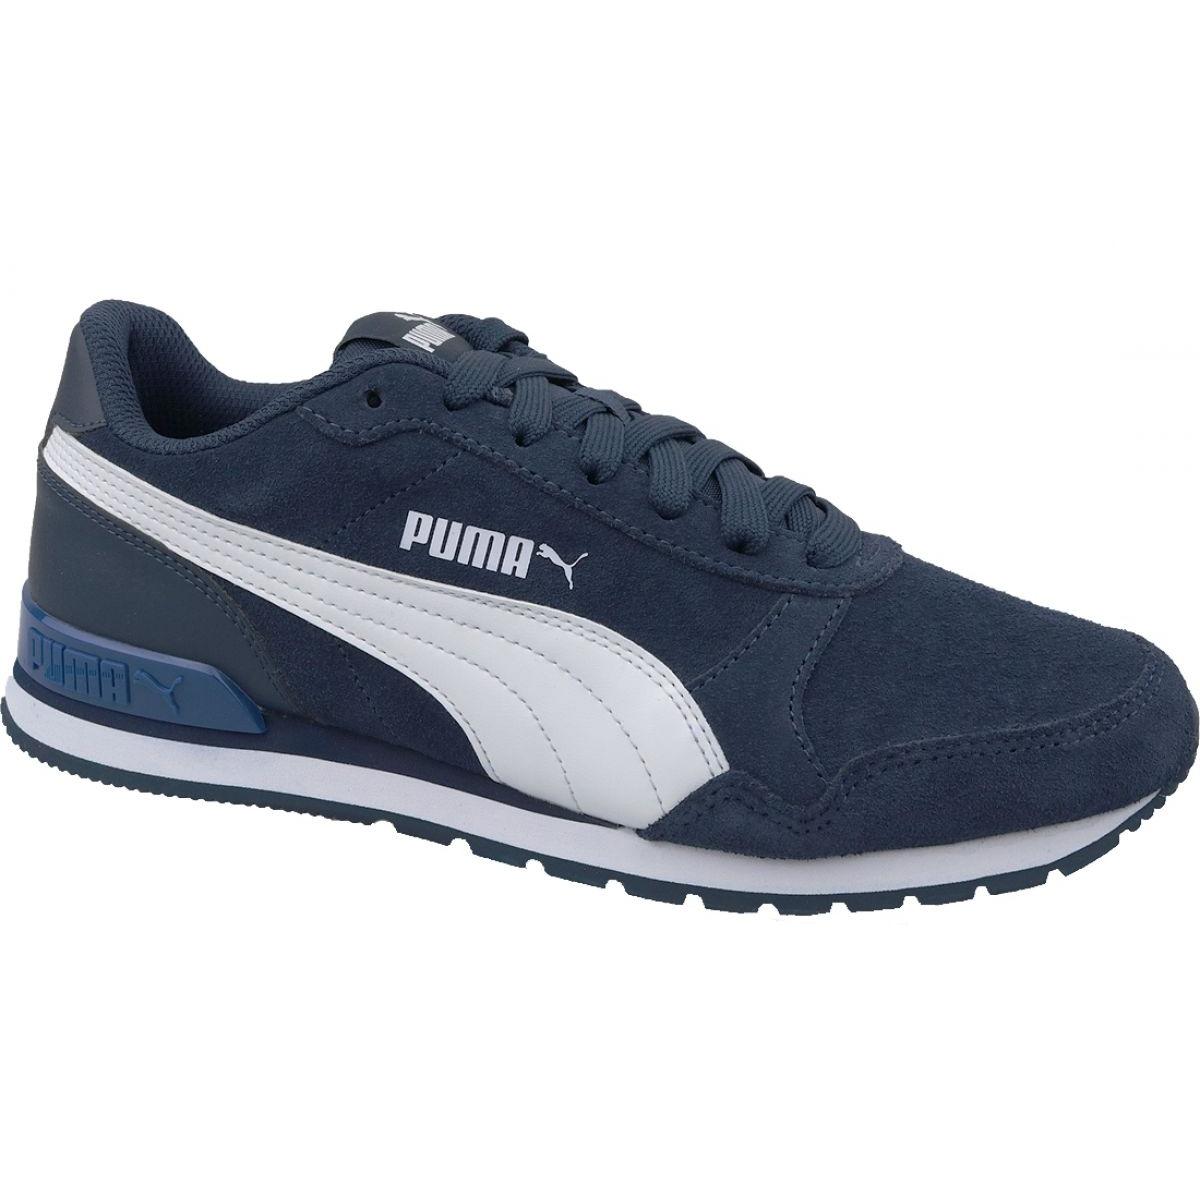 Cipők Puma St Trainer Evo V2 M 363742 02 fehér ButyModne.pl